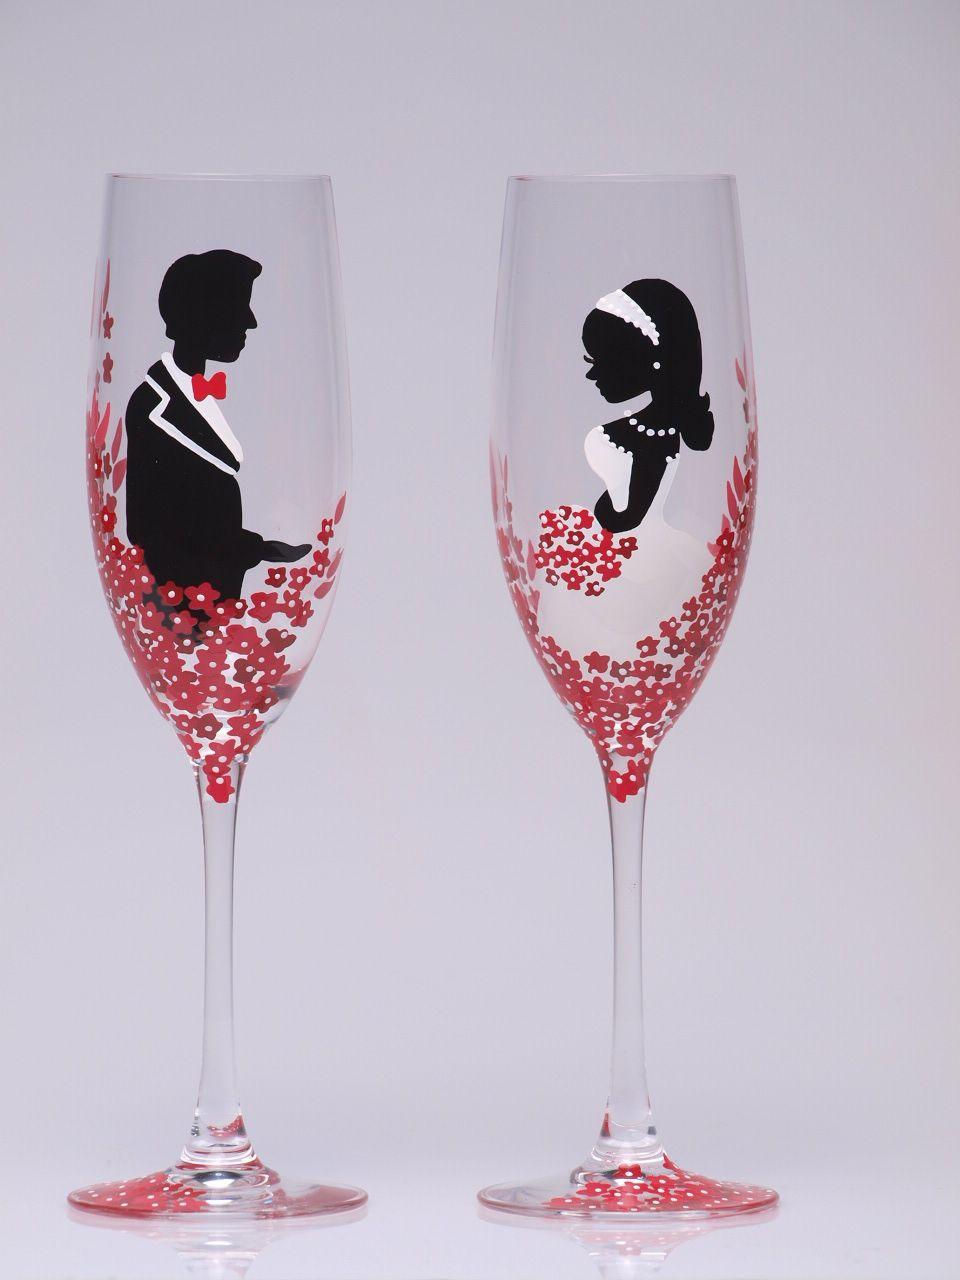 Wedding Champagne Flute Toasting Flutes Wedding Wedding Champagne Glasses Hand Painted Wedding